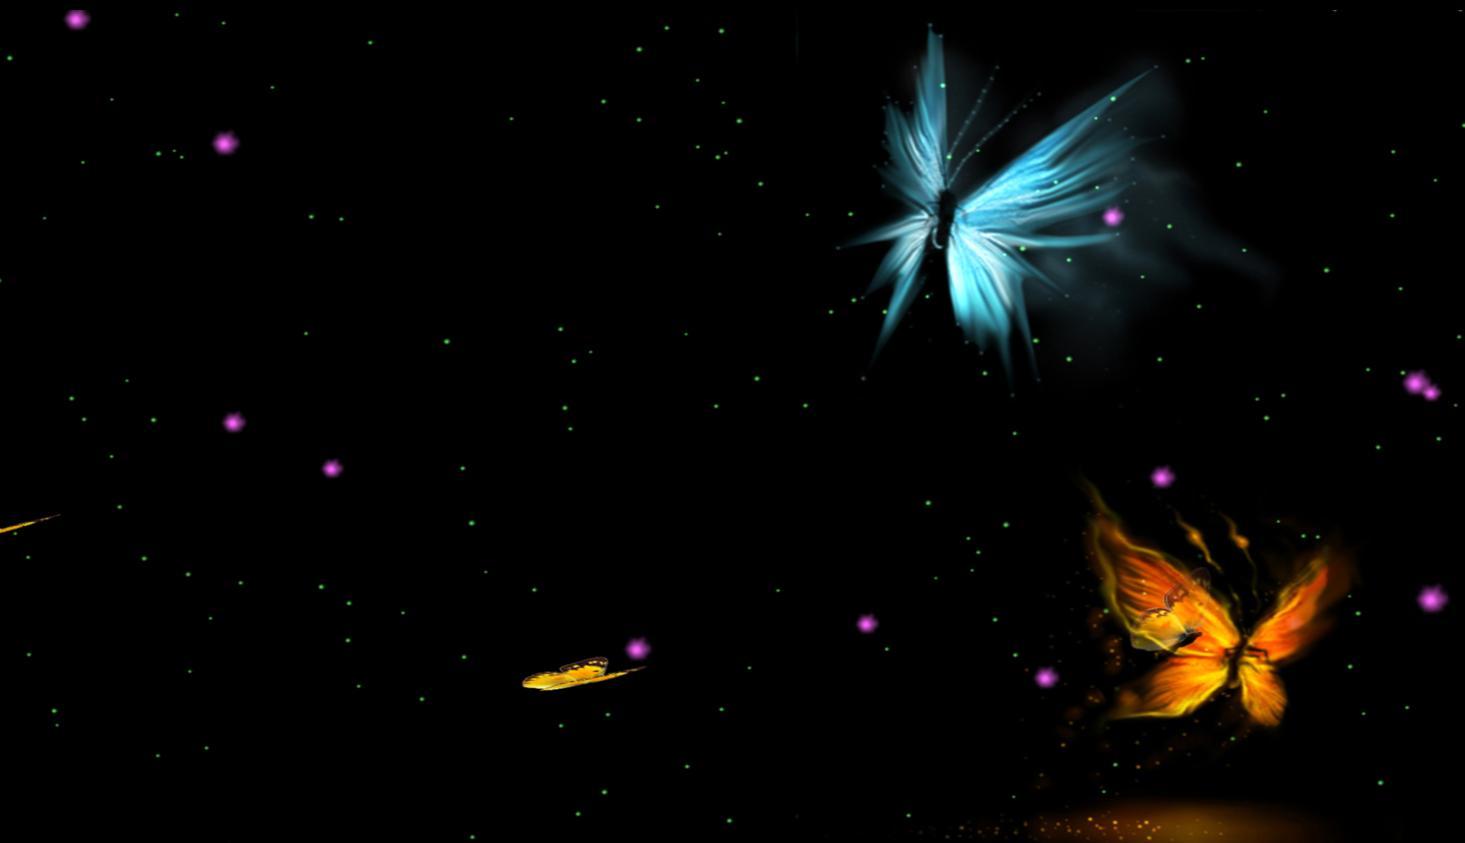 Fantastic Butterfly Screensaver